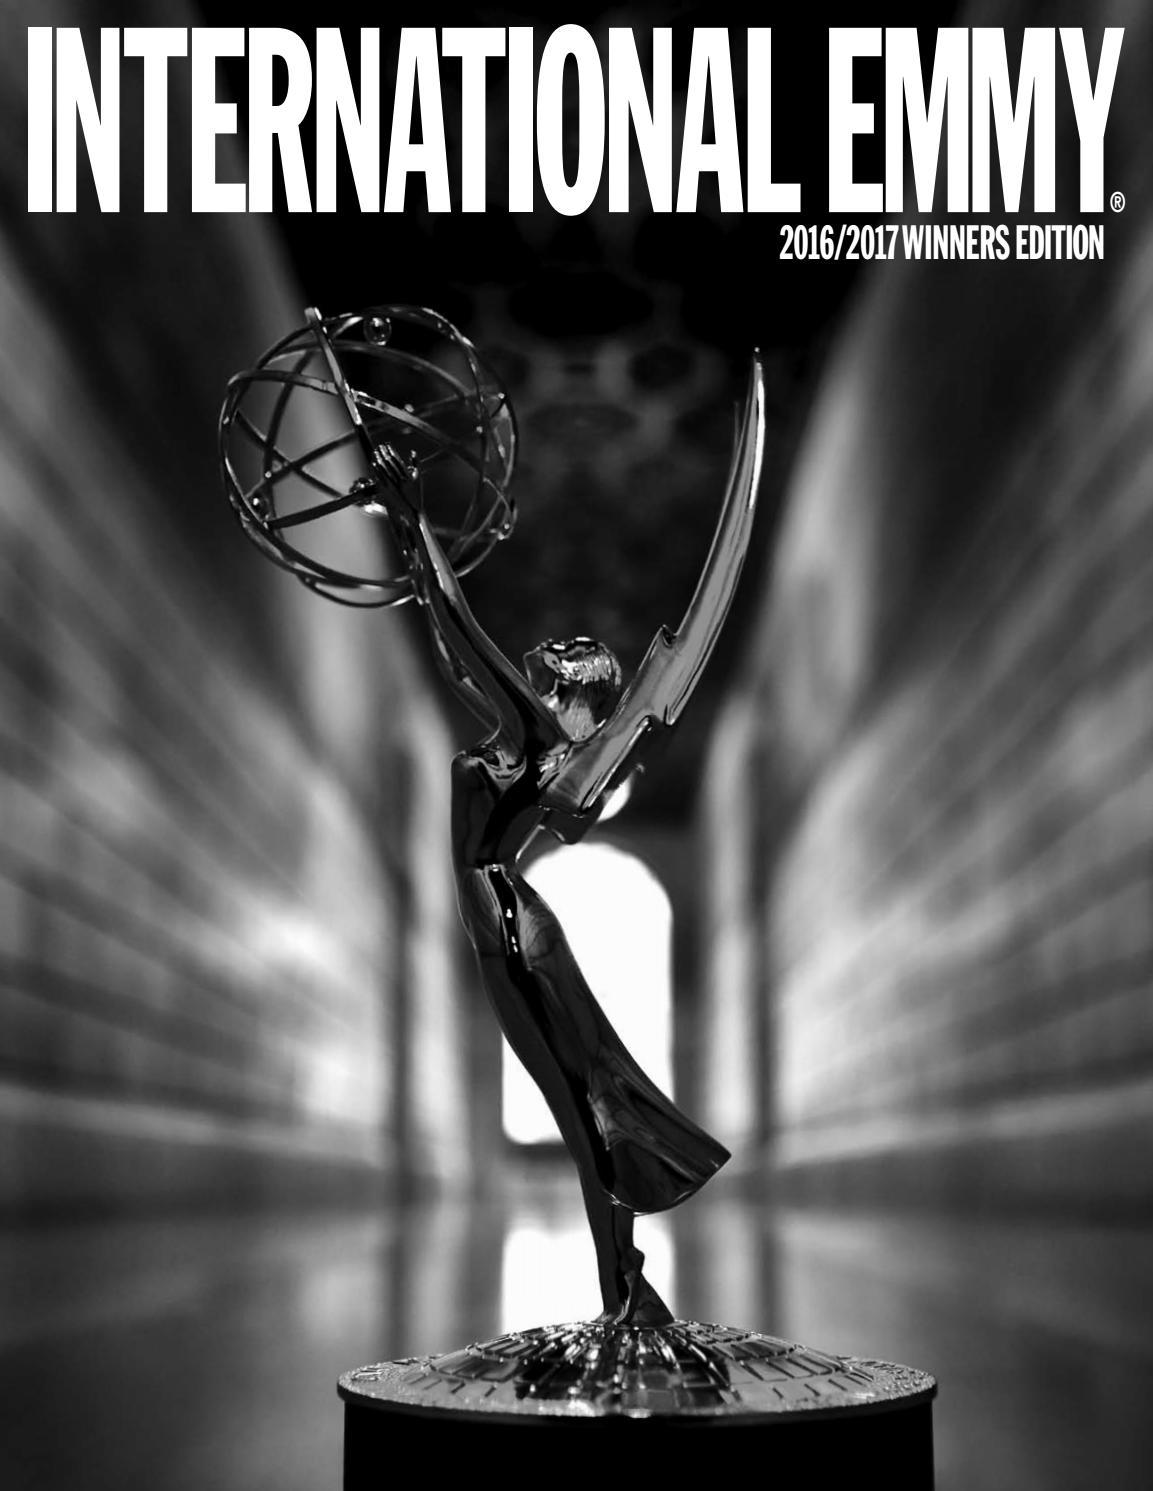 International Emmy Winners Edition 2016-2017